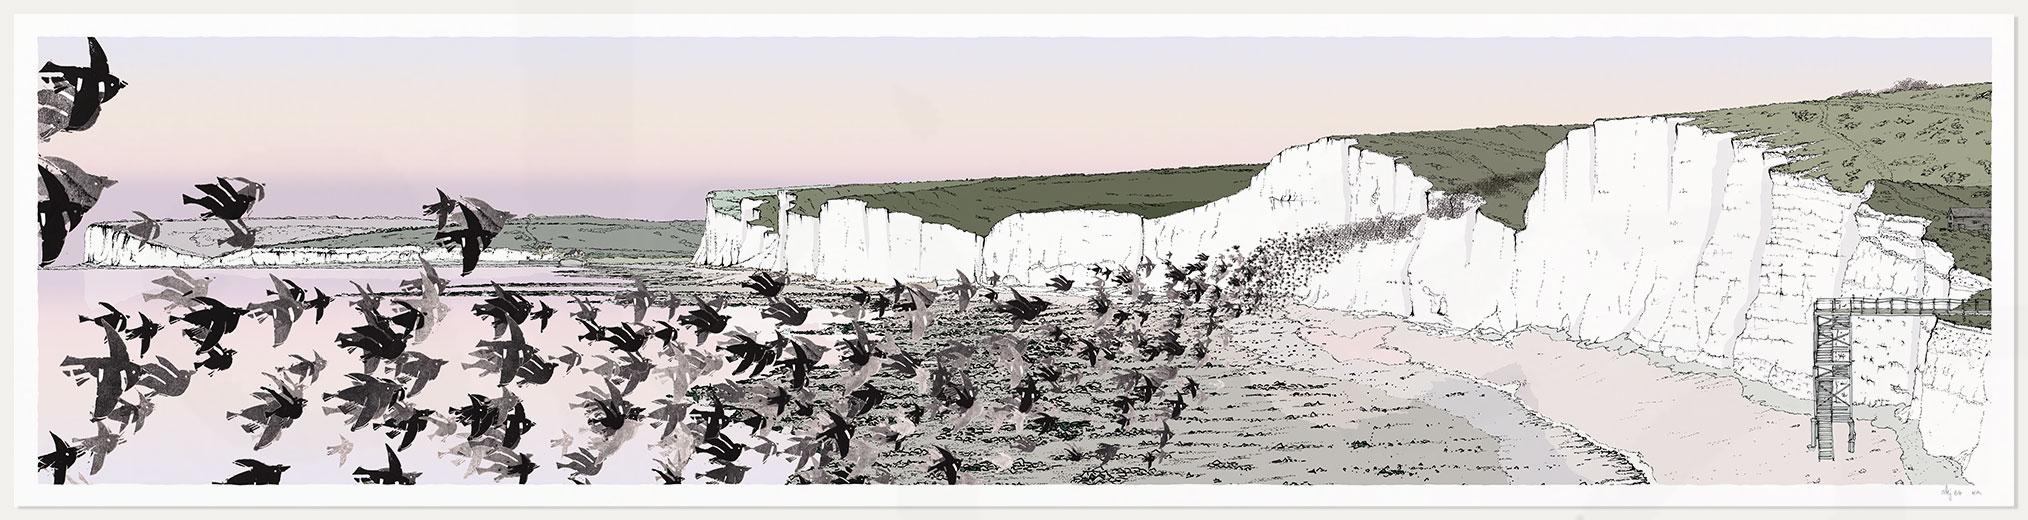 print named Birling Gap Starling Murmuration Eventide by artist alej ez